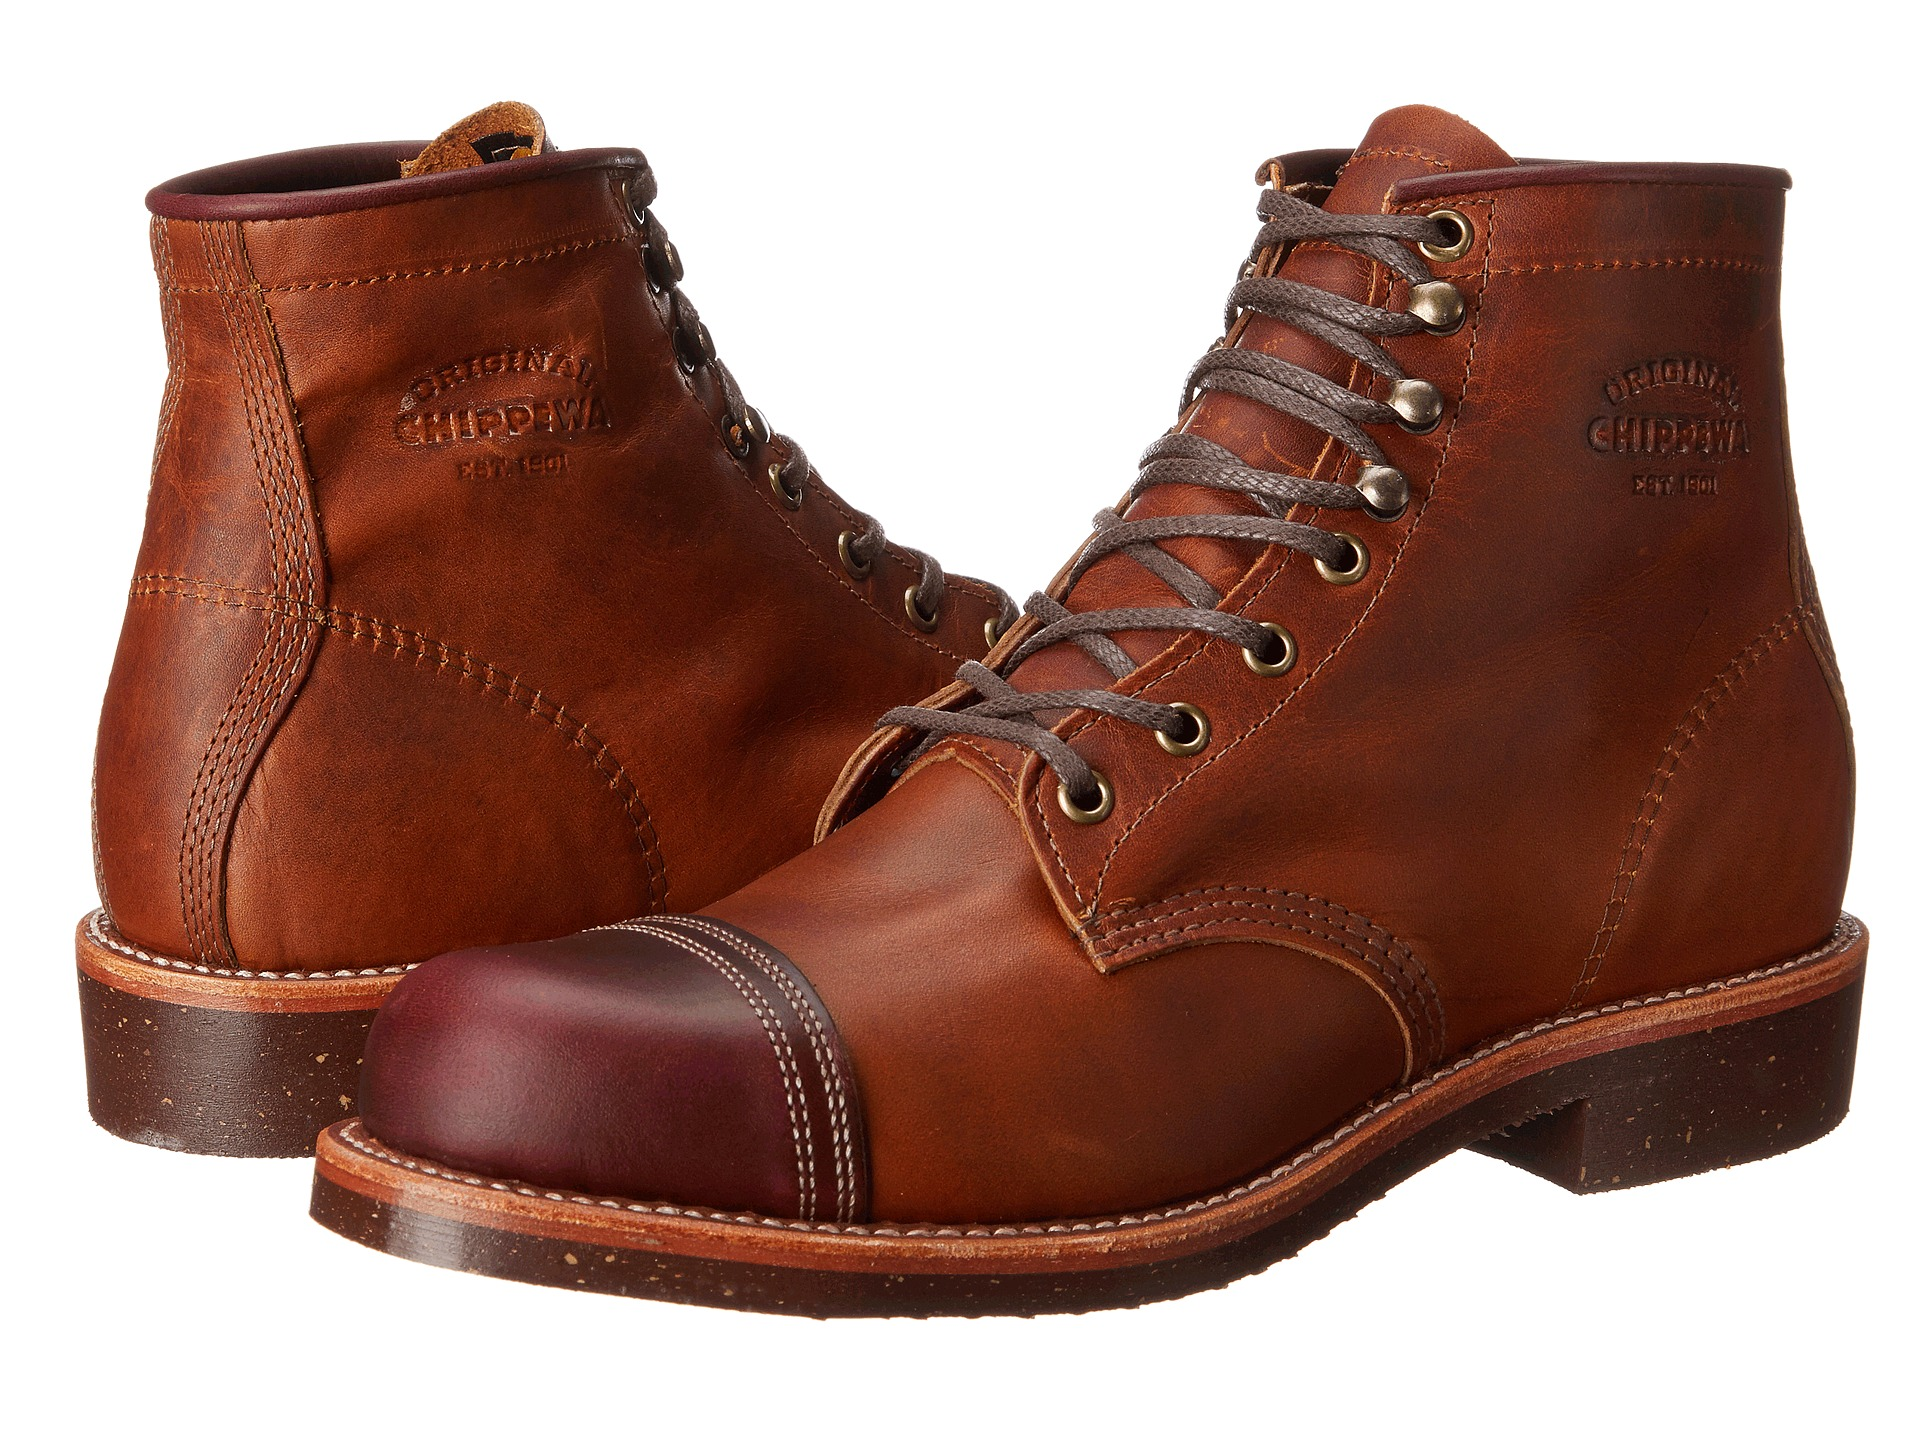 "Chippewa 6"" Homestead Boot Tan Renegade/Crodovan"